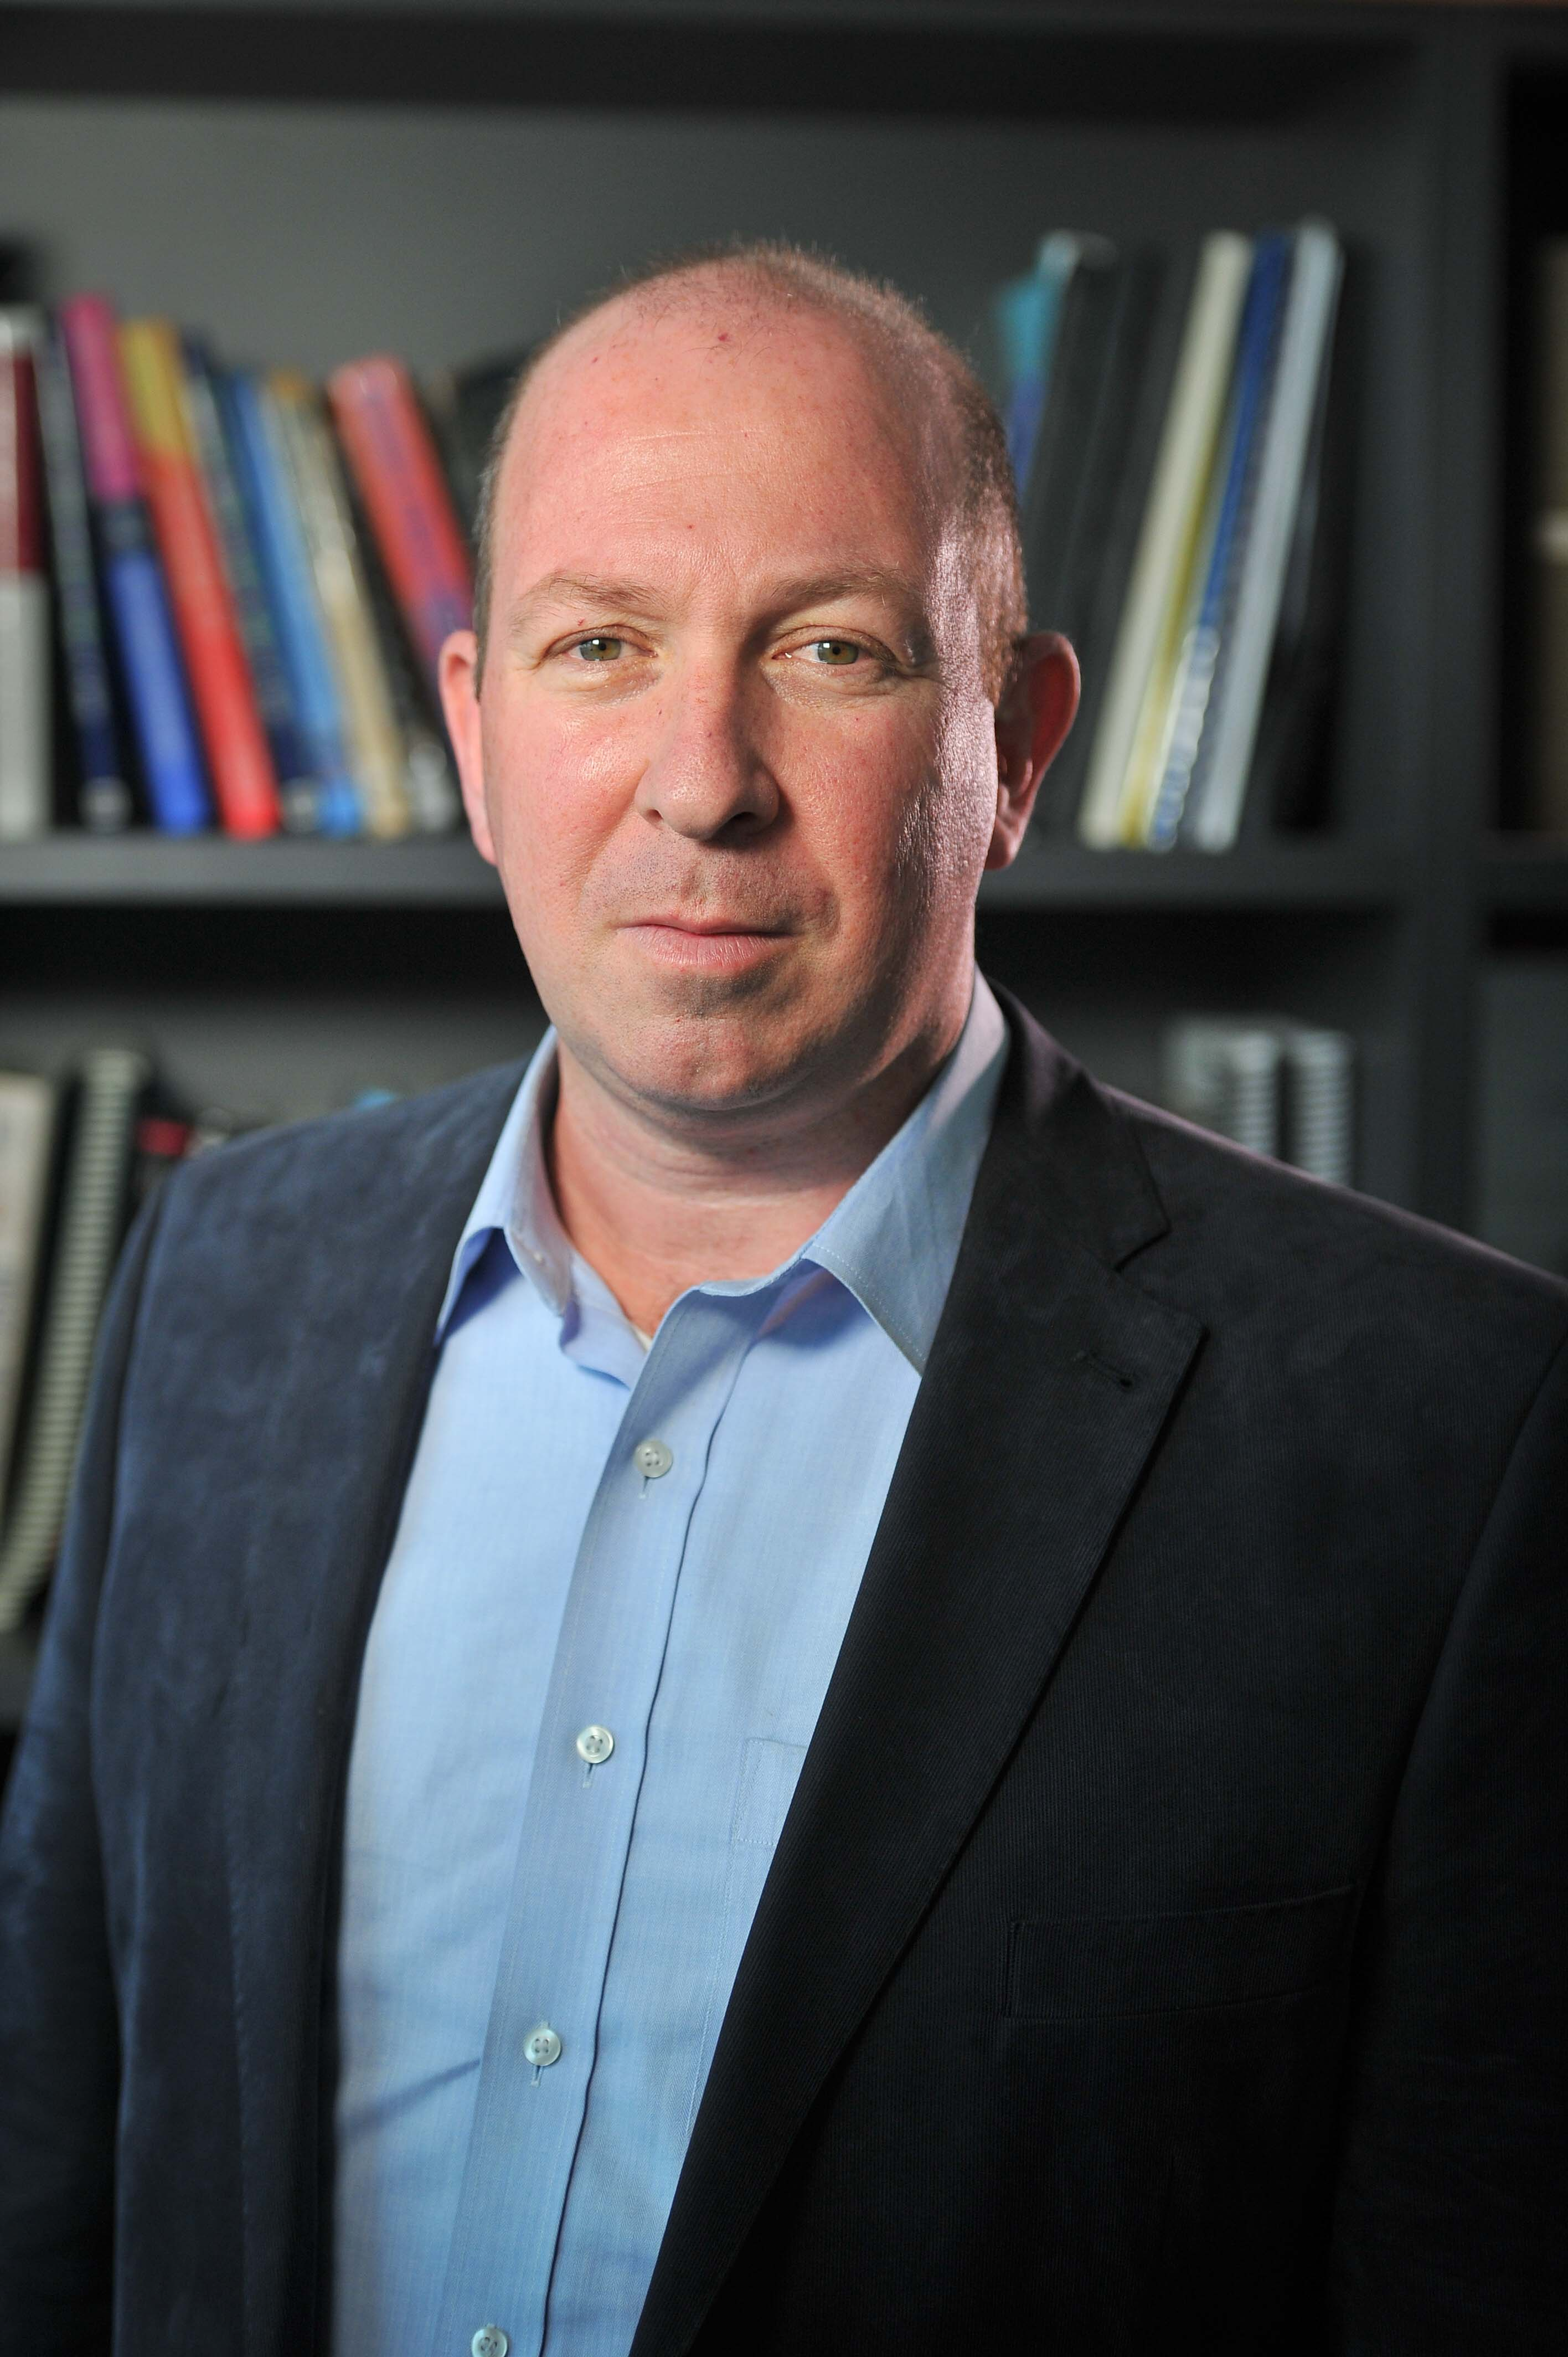 Prof. Alon Wolf, PhD